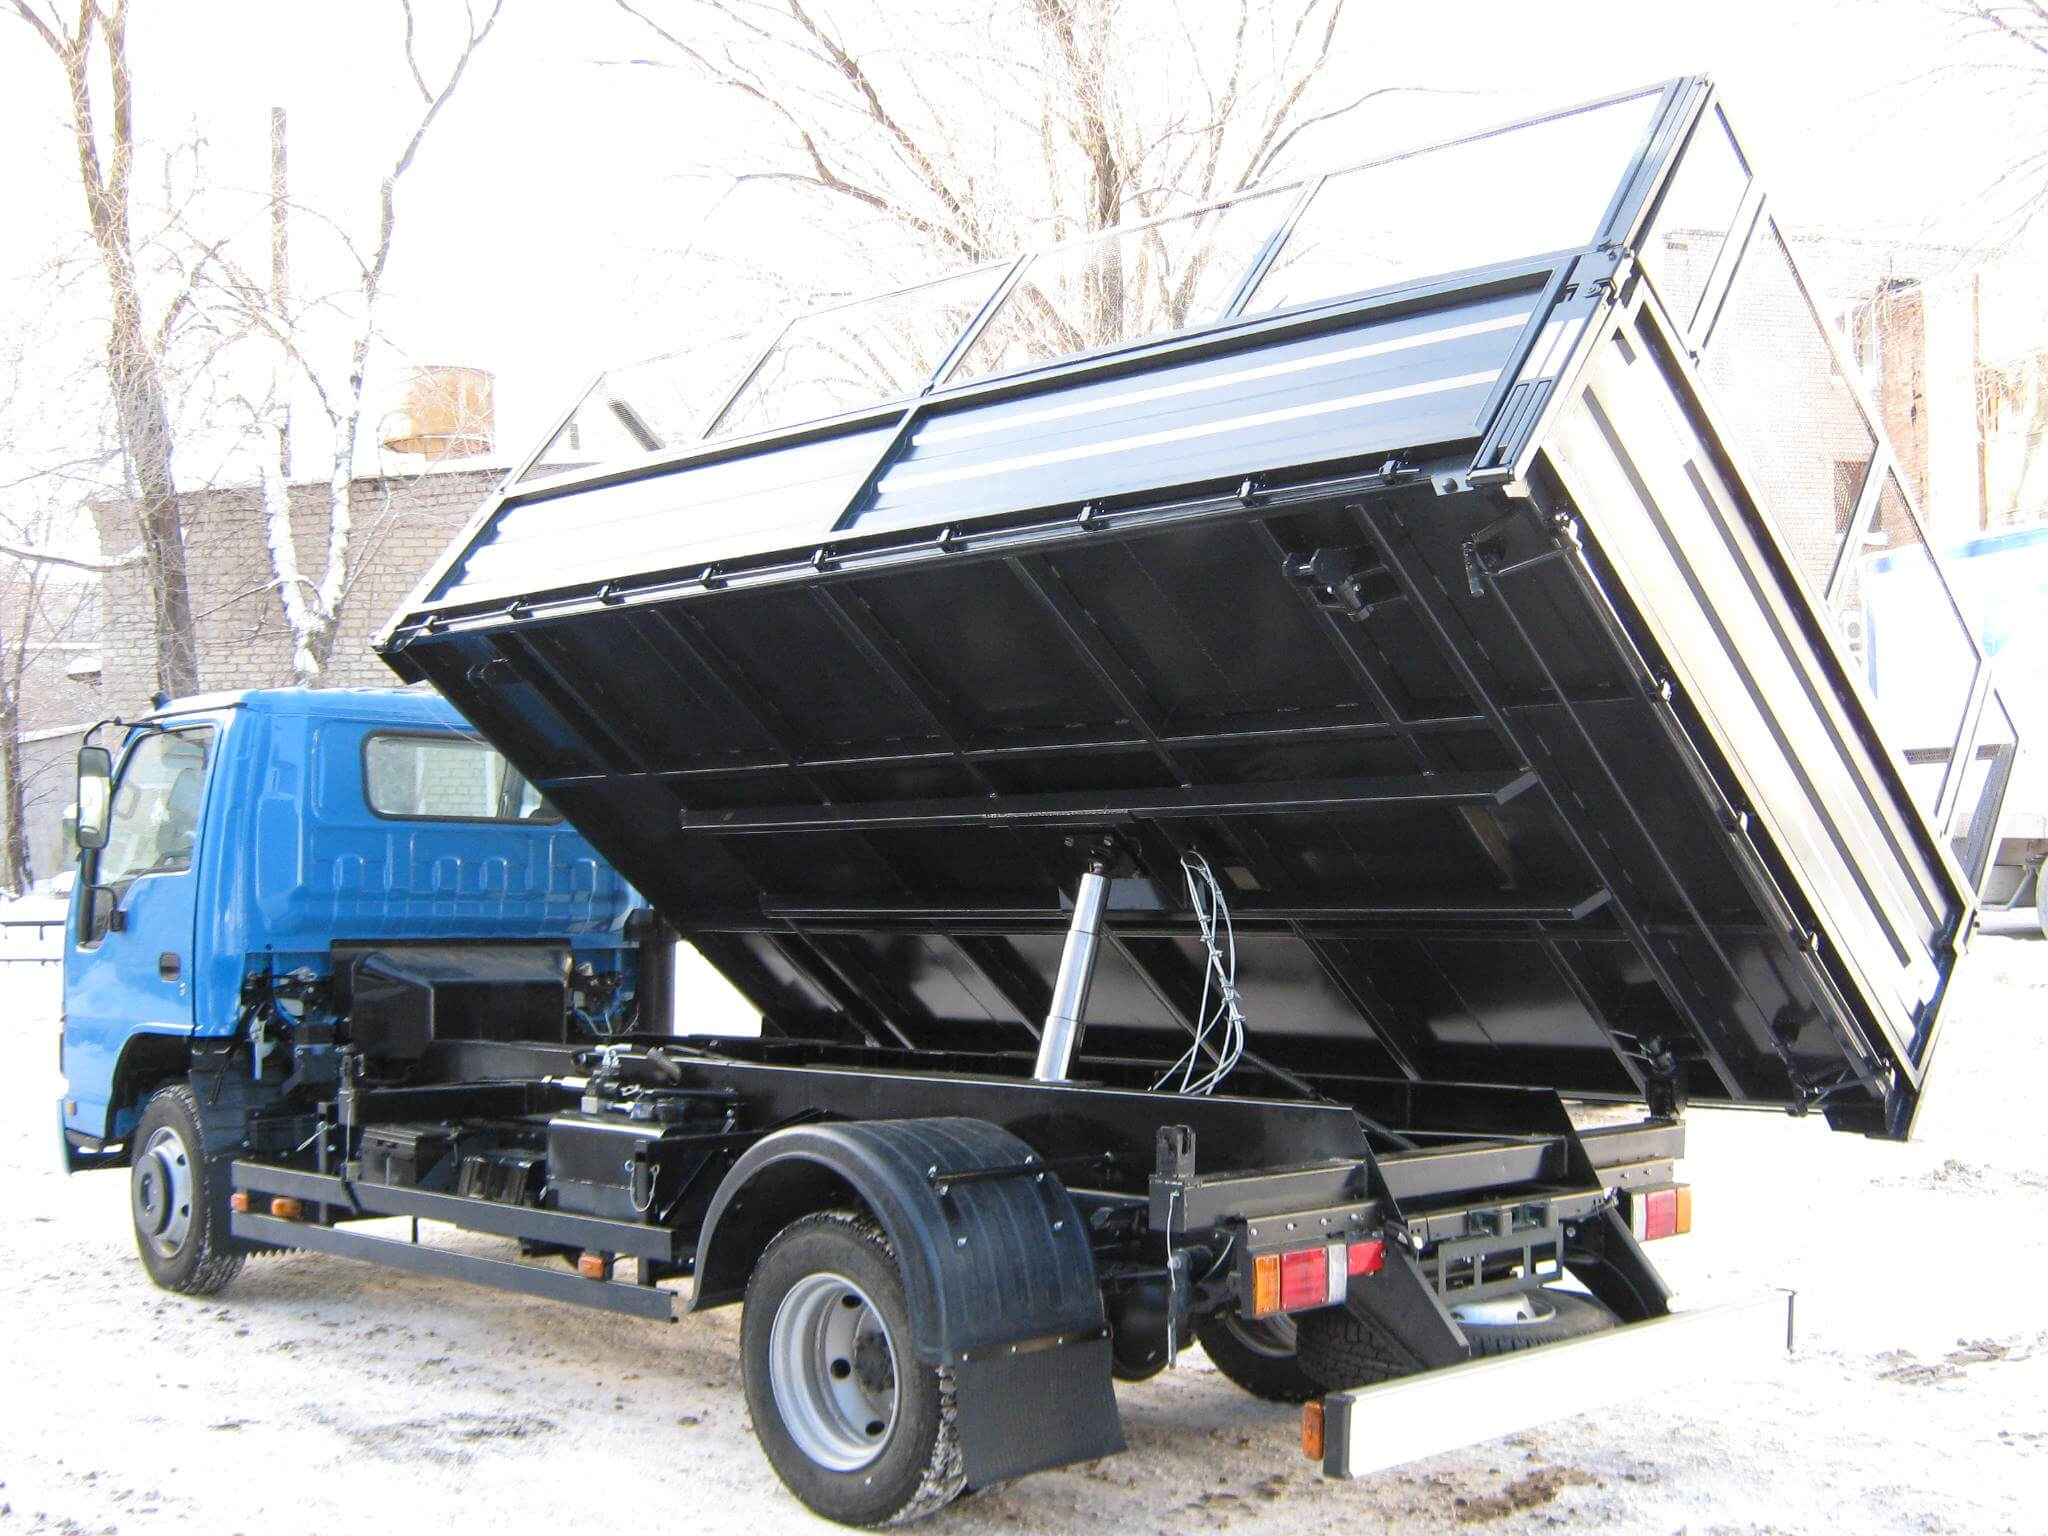 hyndai-hd-78-samosval-2